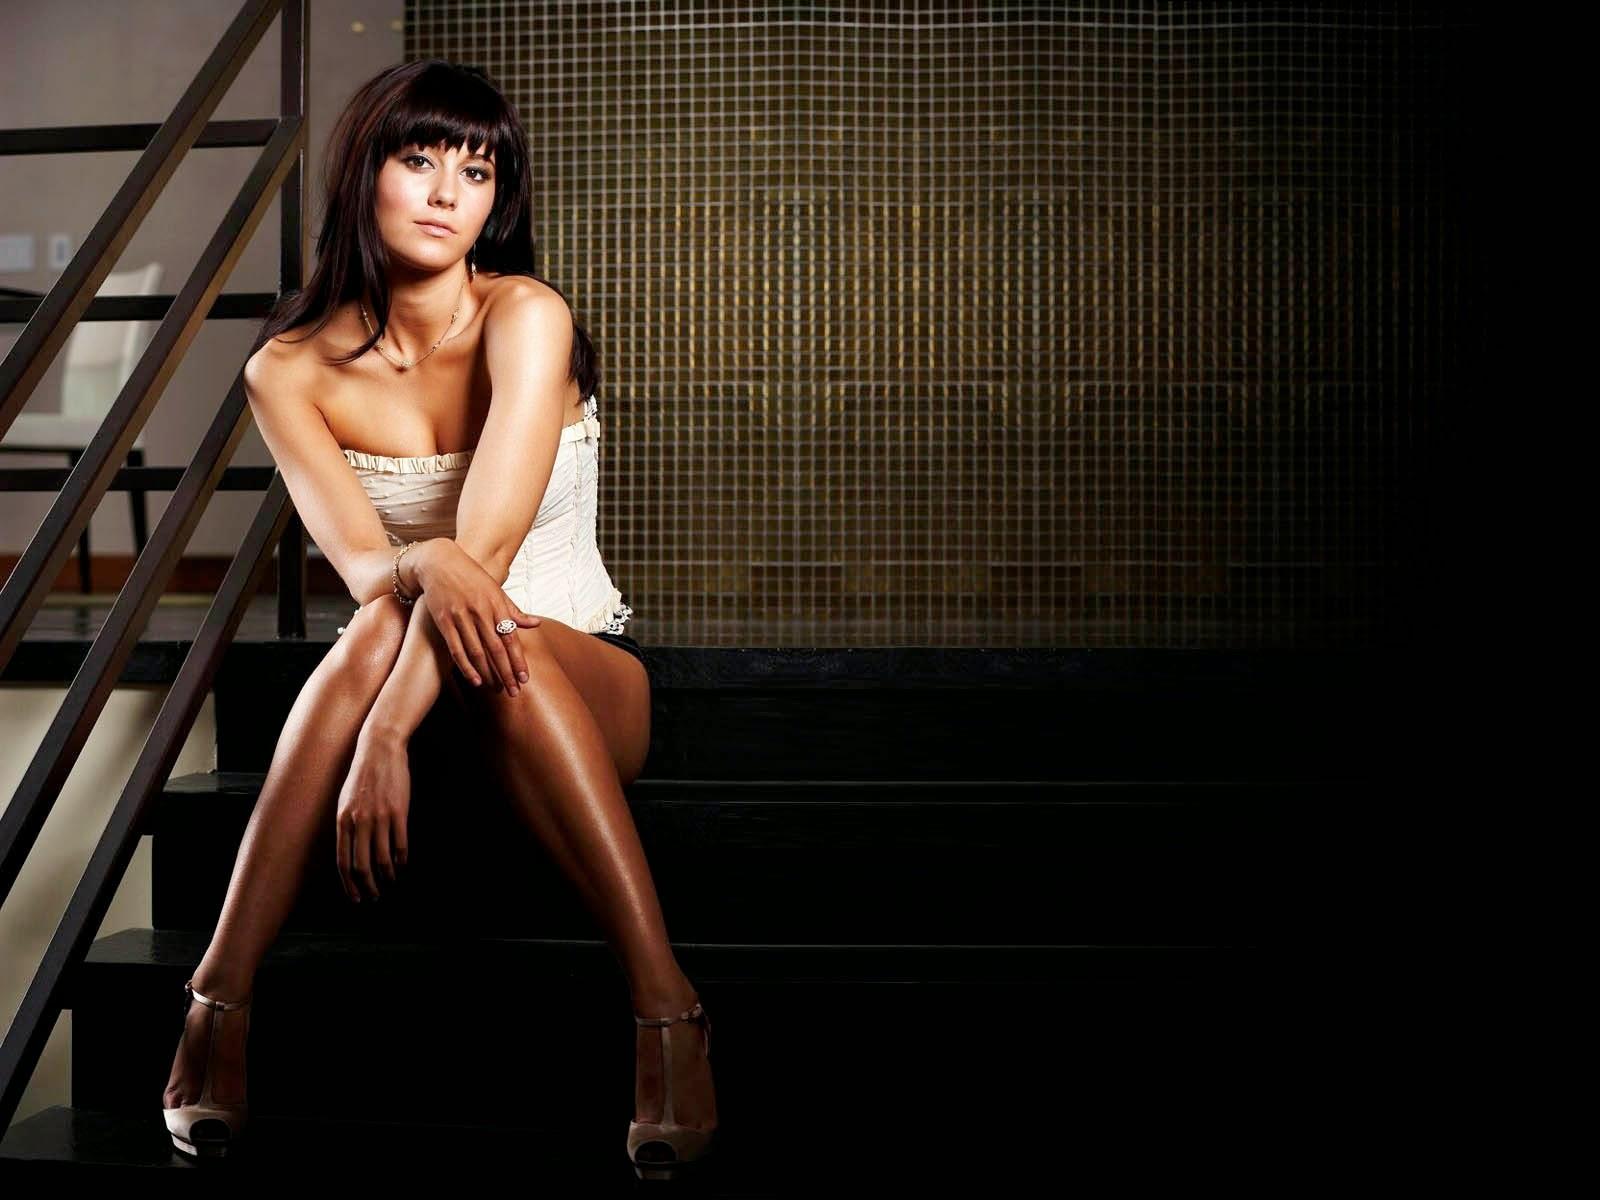 sluchaynie-video-erotika-kazakstan-bar